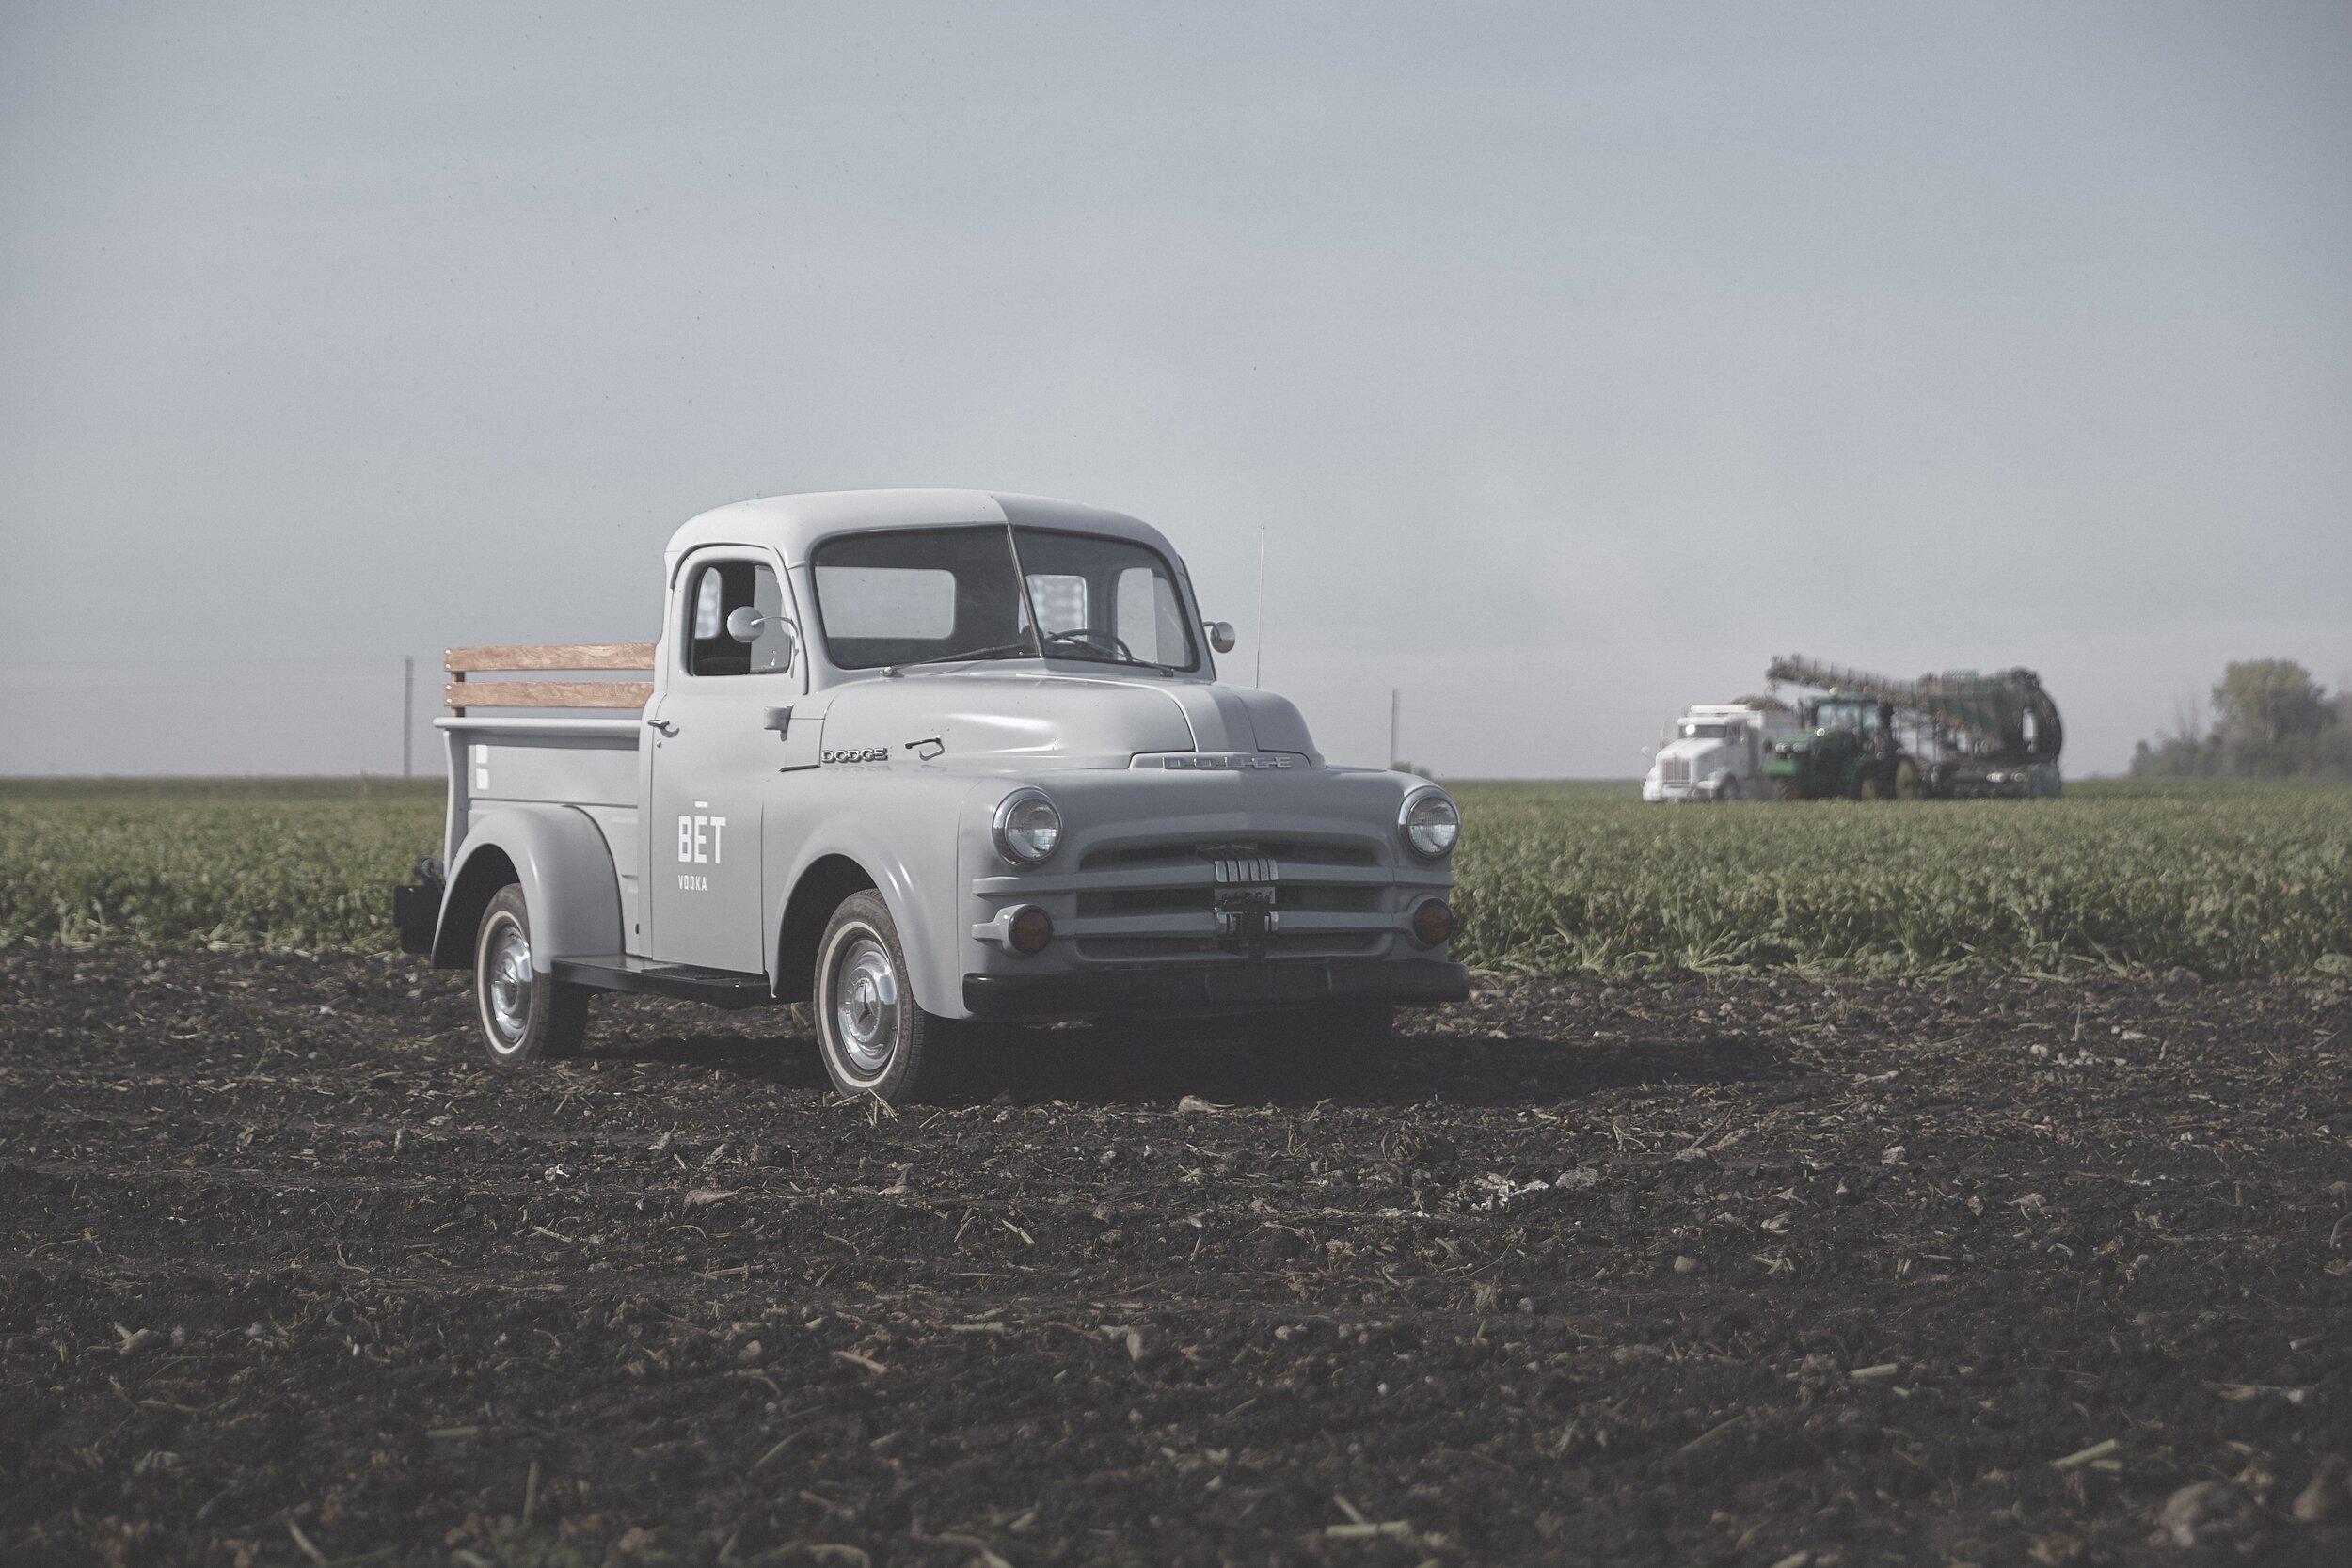 Meet Henry! BĒT Vodka's travel companion- a 1951 Dodge farm truck, named after American sugar beet connoisseur Henry Oxnard.